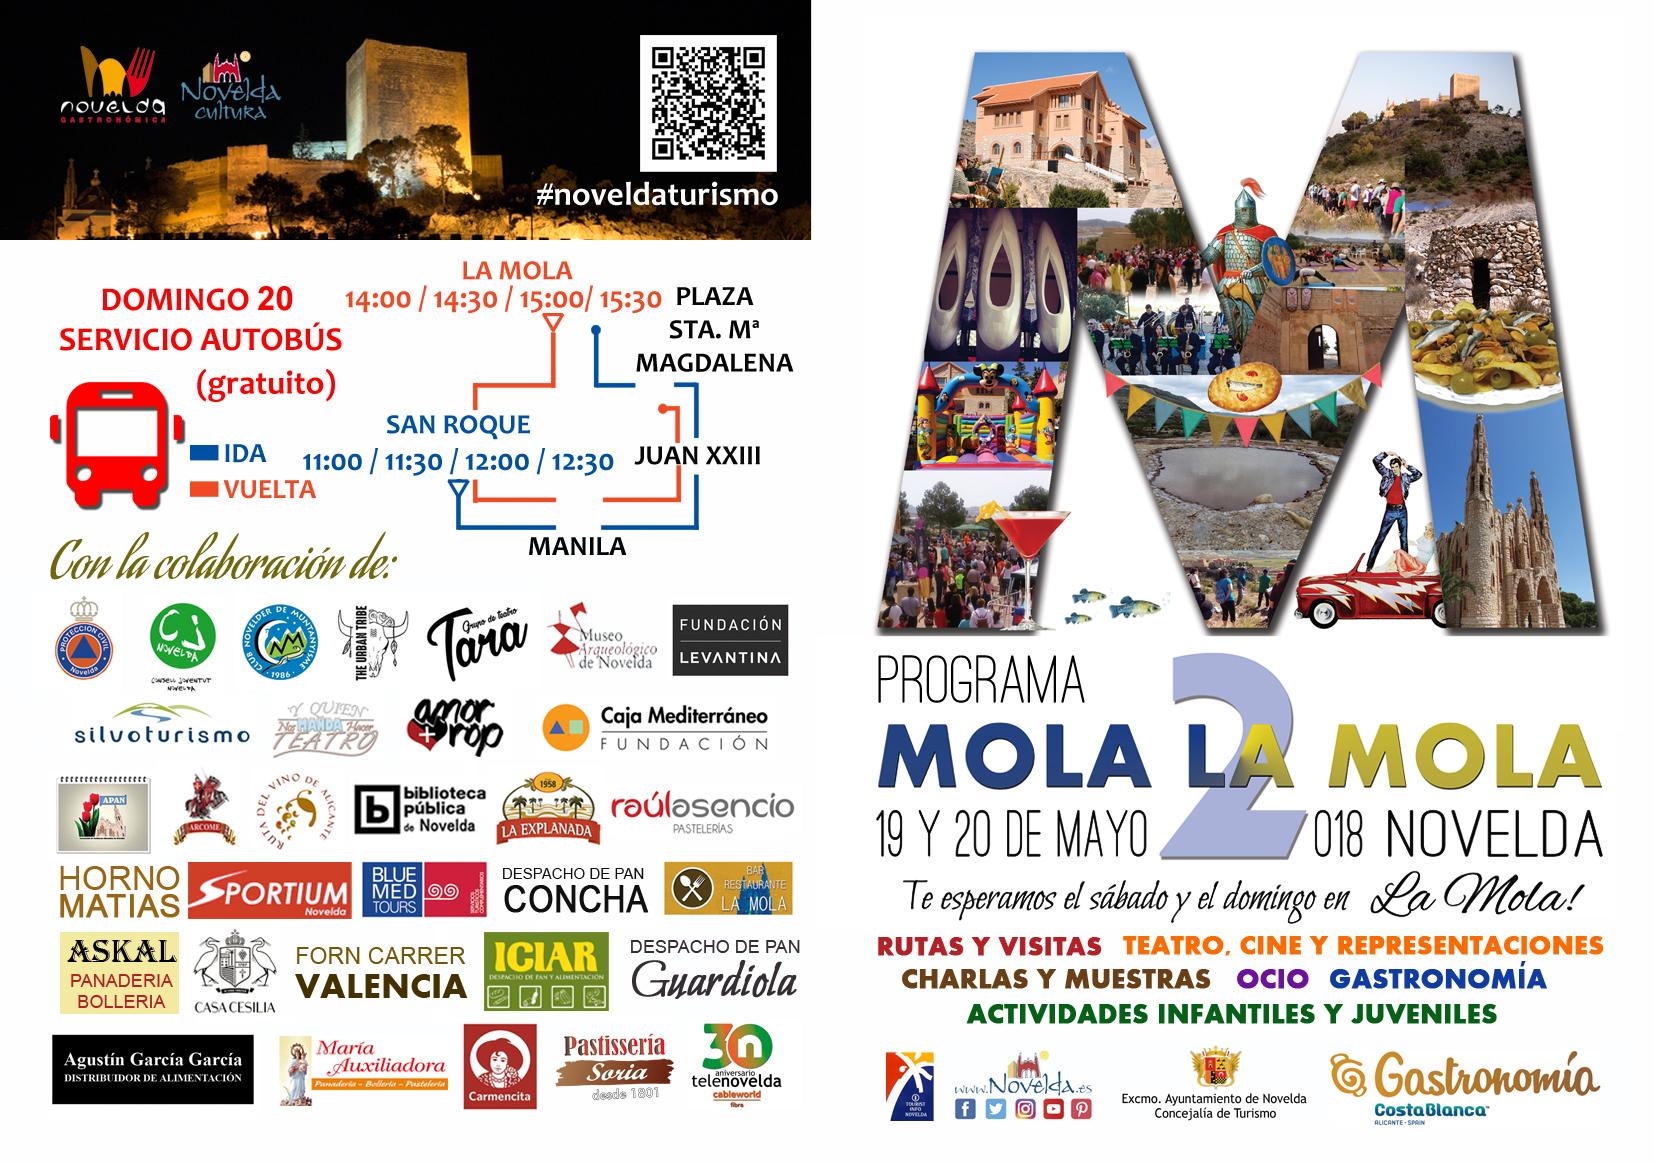 PROGRAMACION EXTERIOR MOLA Novelda LA MOLA 2018